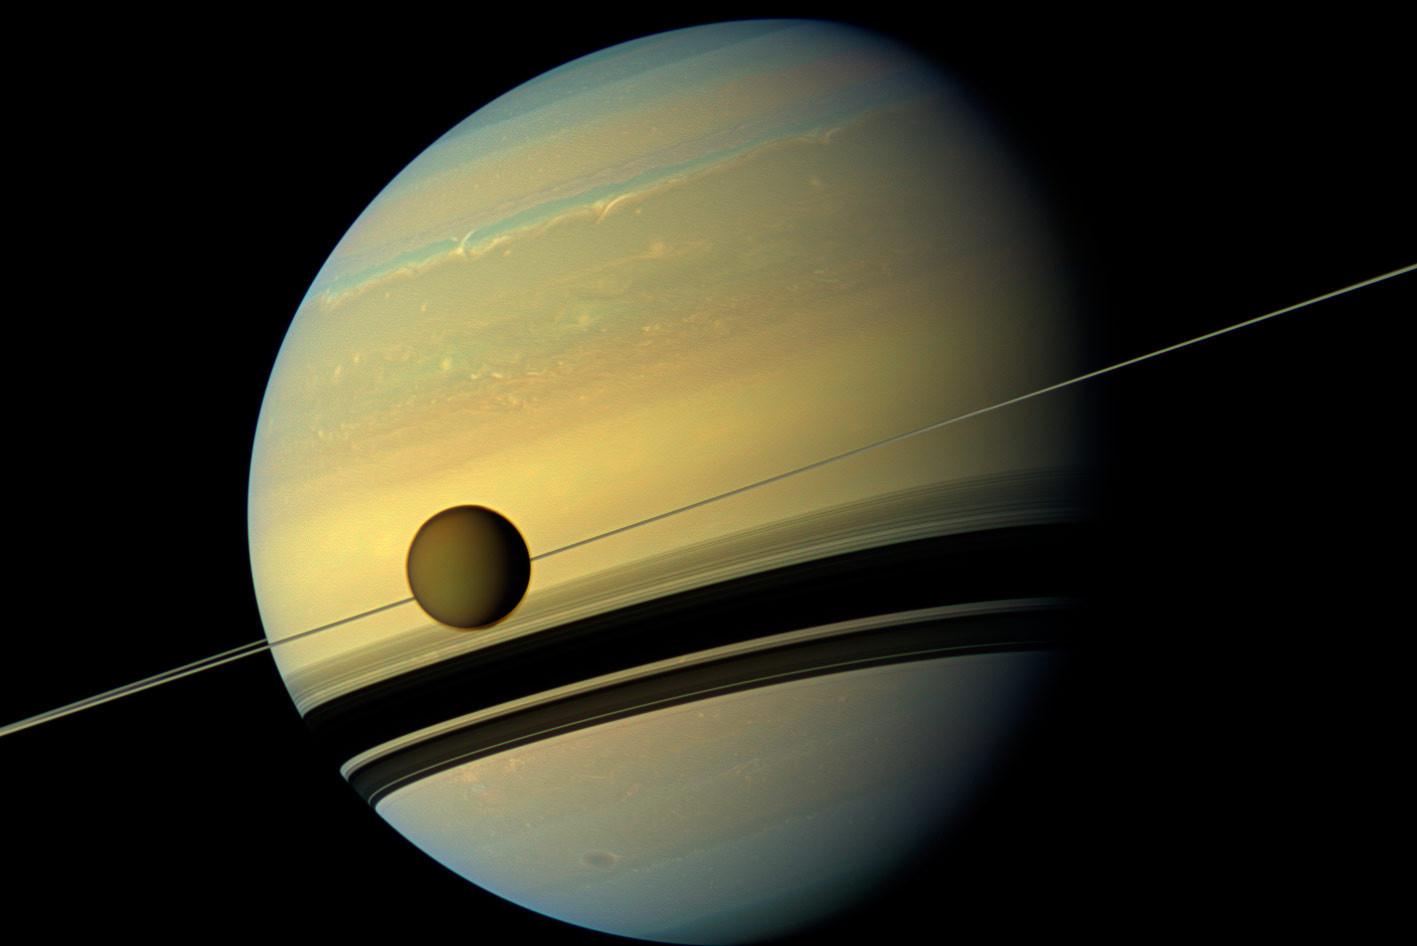 "<p>Фото: &copy;&nbsp;<a href=""https://www.nasa.gov/feature/goddard/2016/nasa-scientists-find-impossible-cloud-on-titan-again"" target=""_blank"">NASA</a></p>"